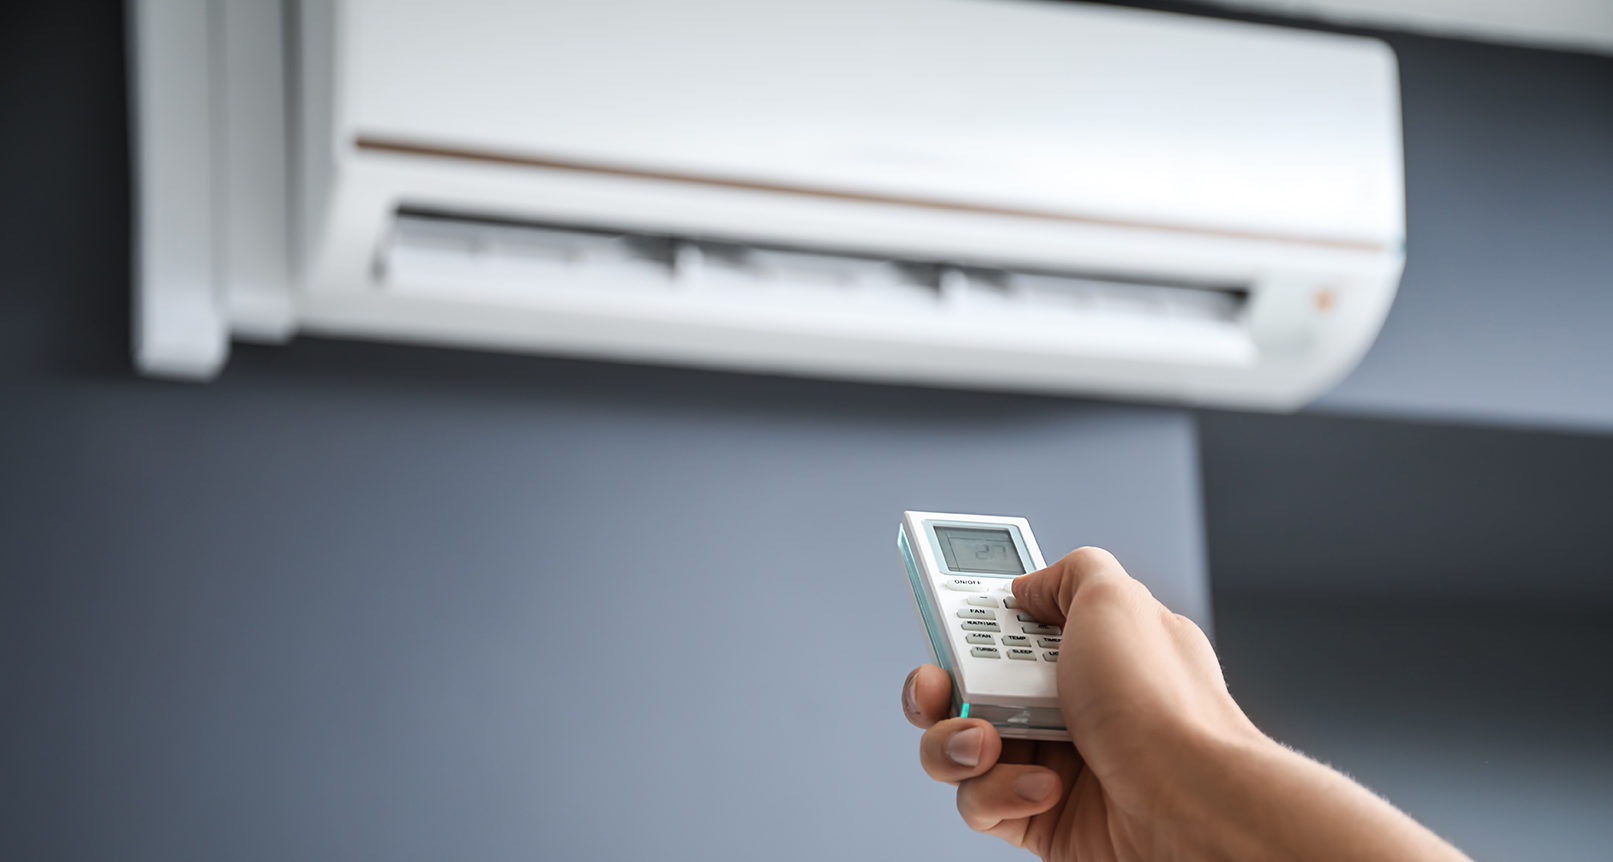 Installateur Climatisation Puy De Dome climatisation, pac : installation, remplacement techniciens